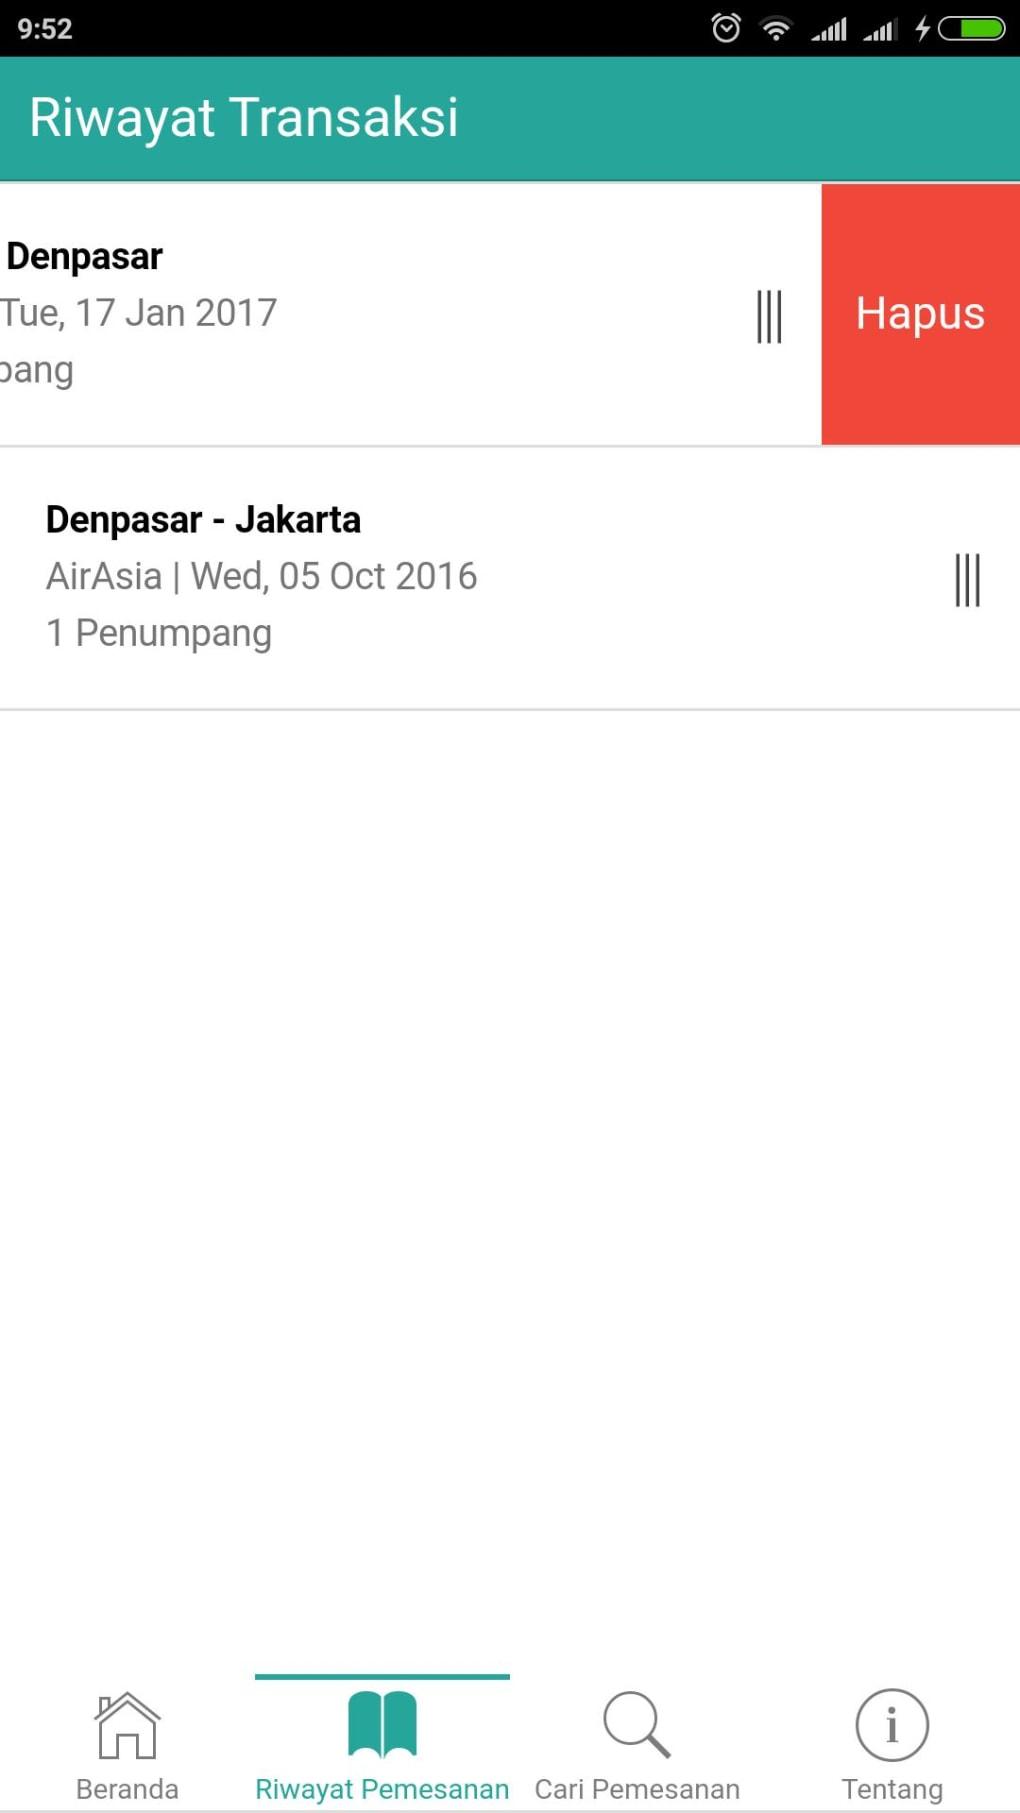 Download mandiri online 2.2.4 for Android - Filehippo.com